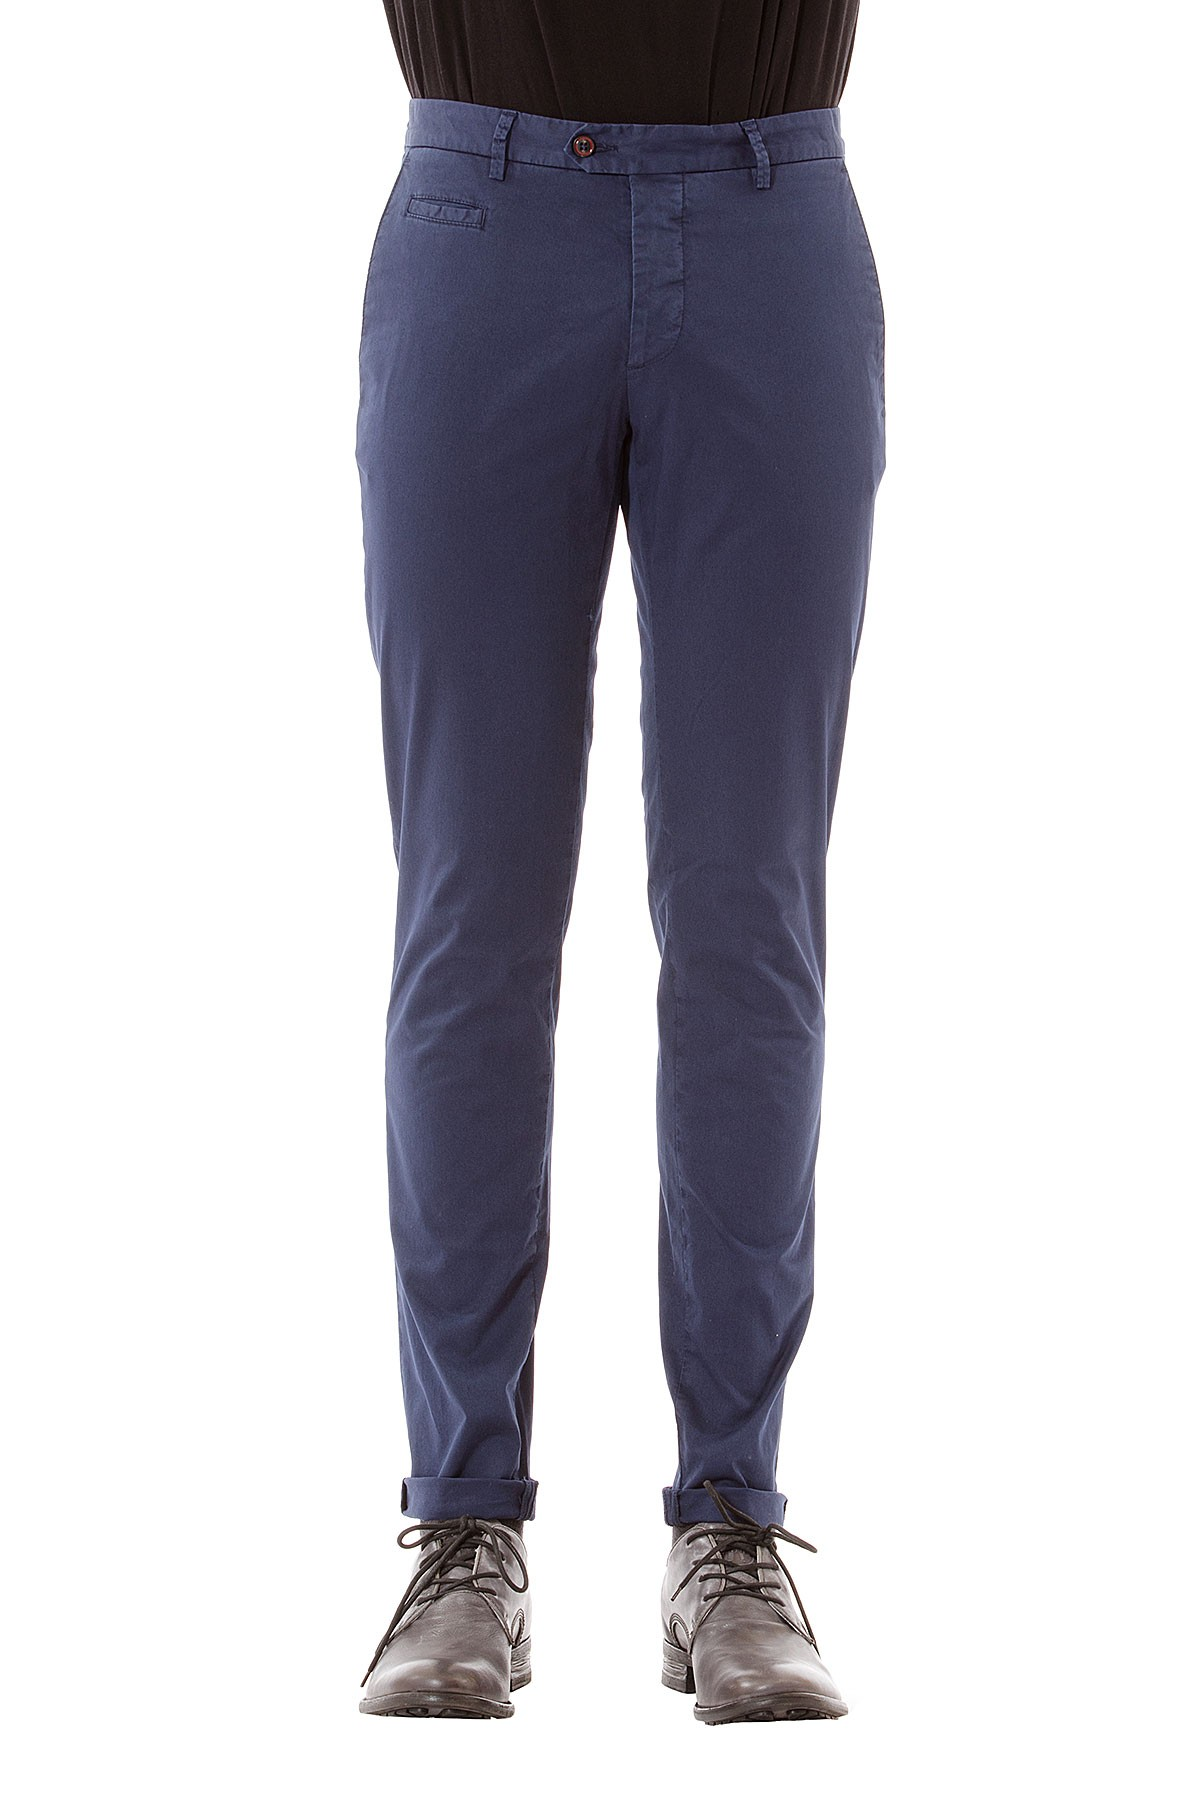 Popolare FAY Abbigliamento Uomo Vendita Online Store Fay - Rione Fontana AZ16